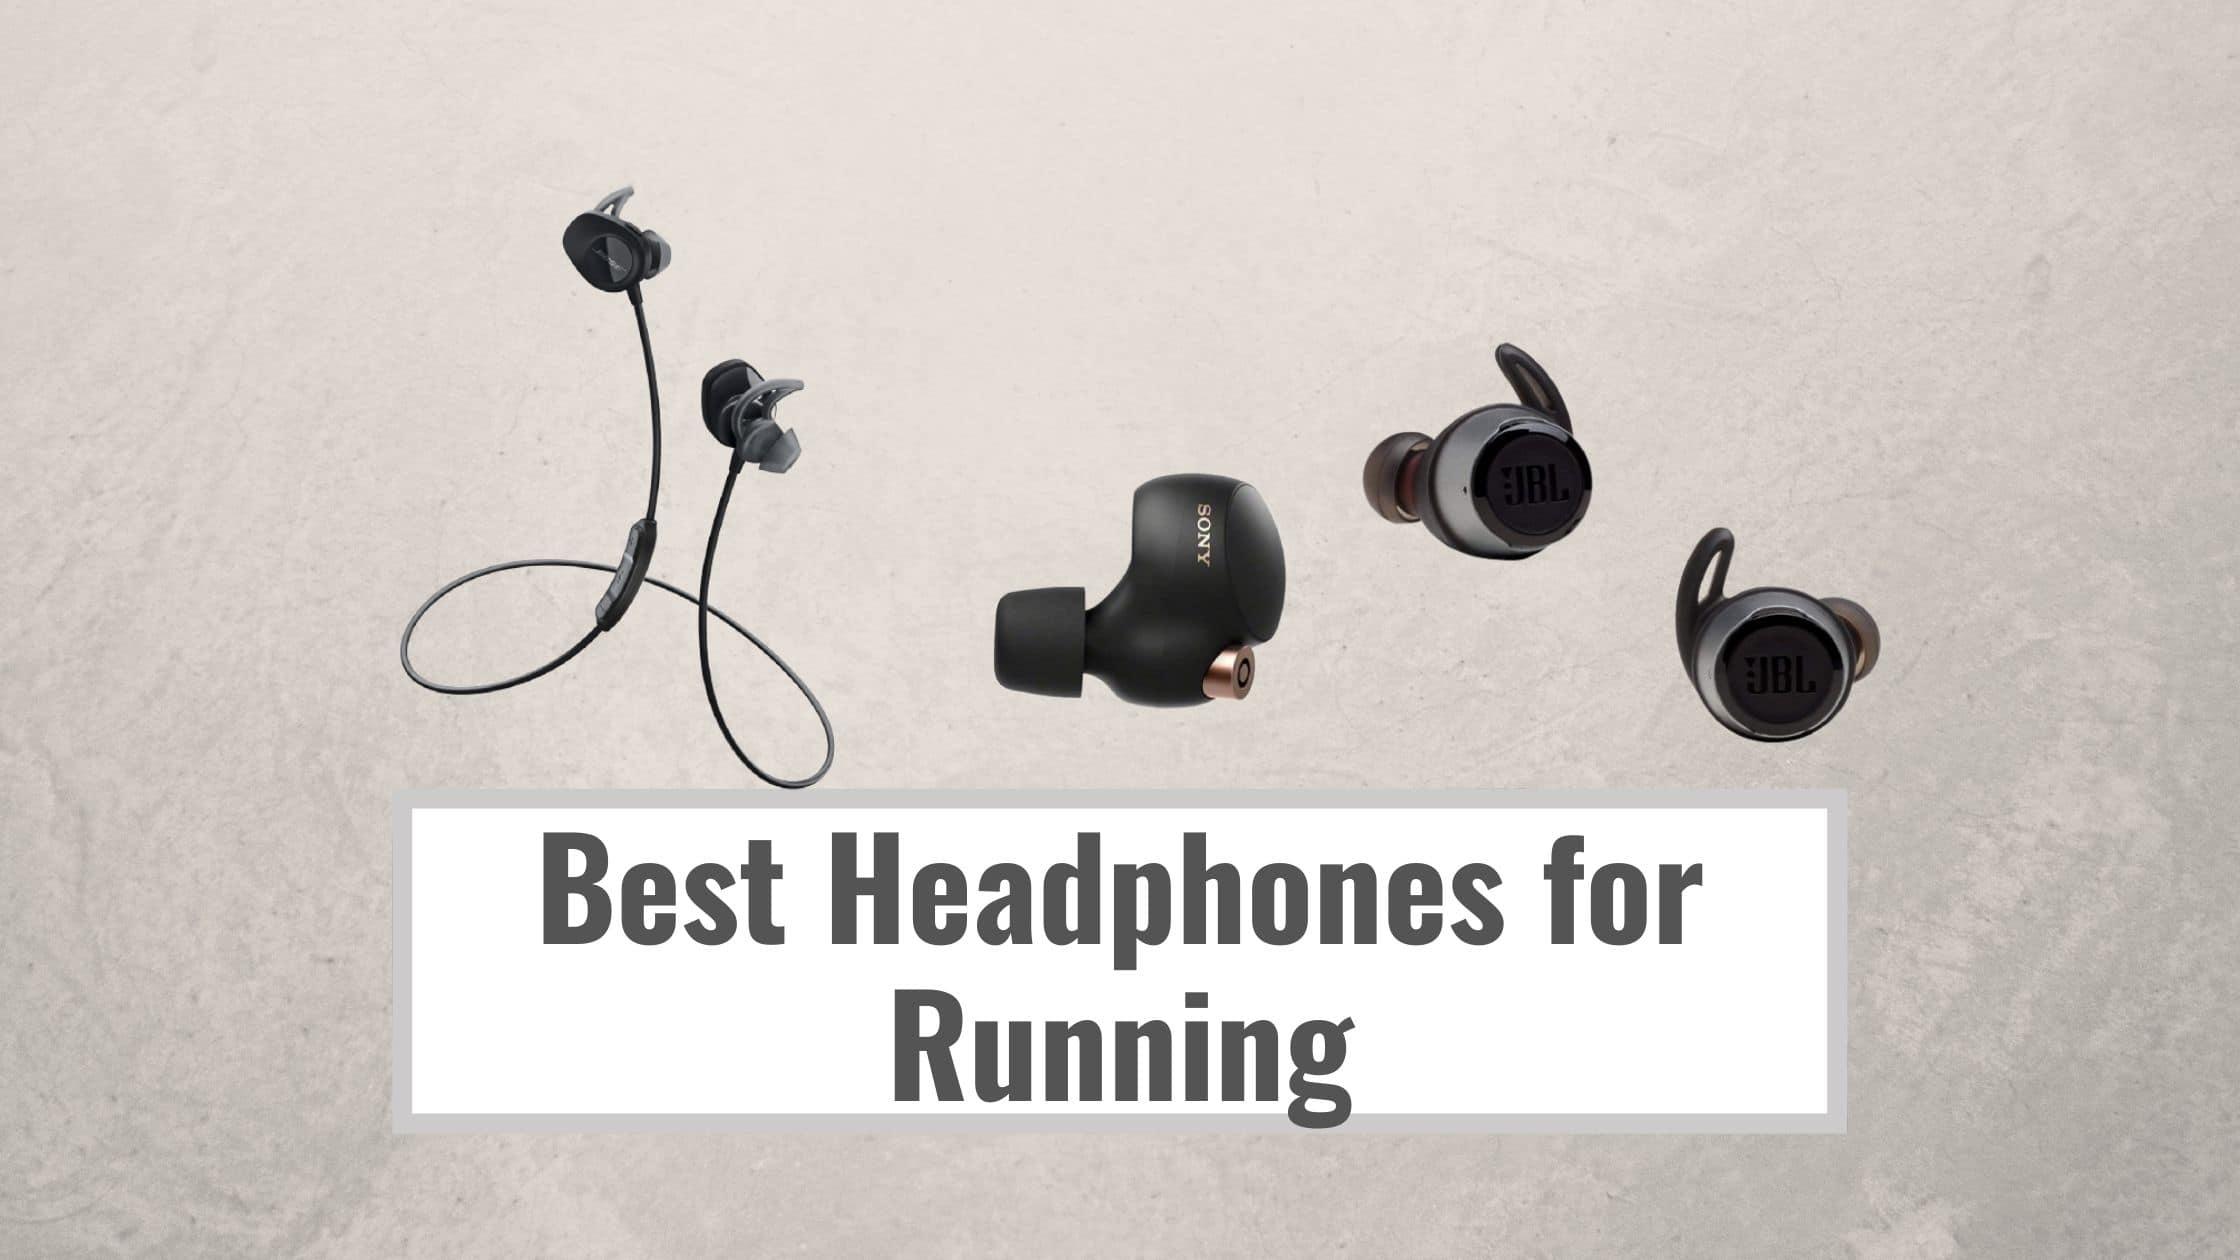 Best Headphones for Running